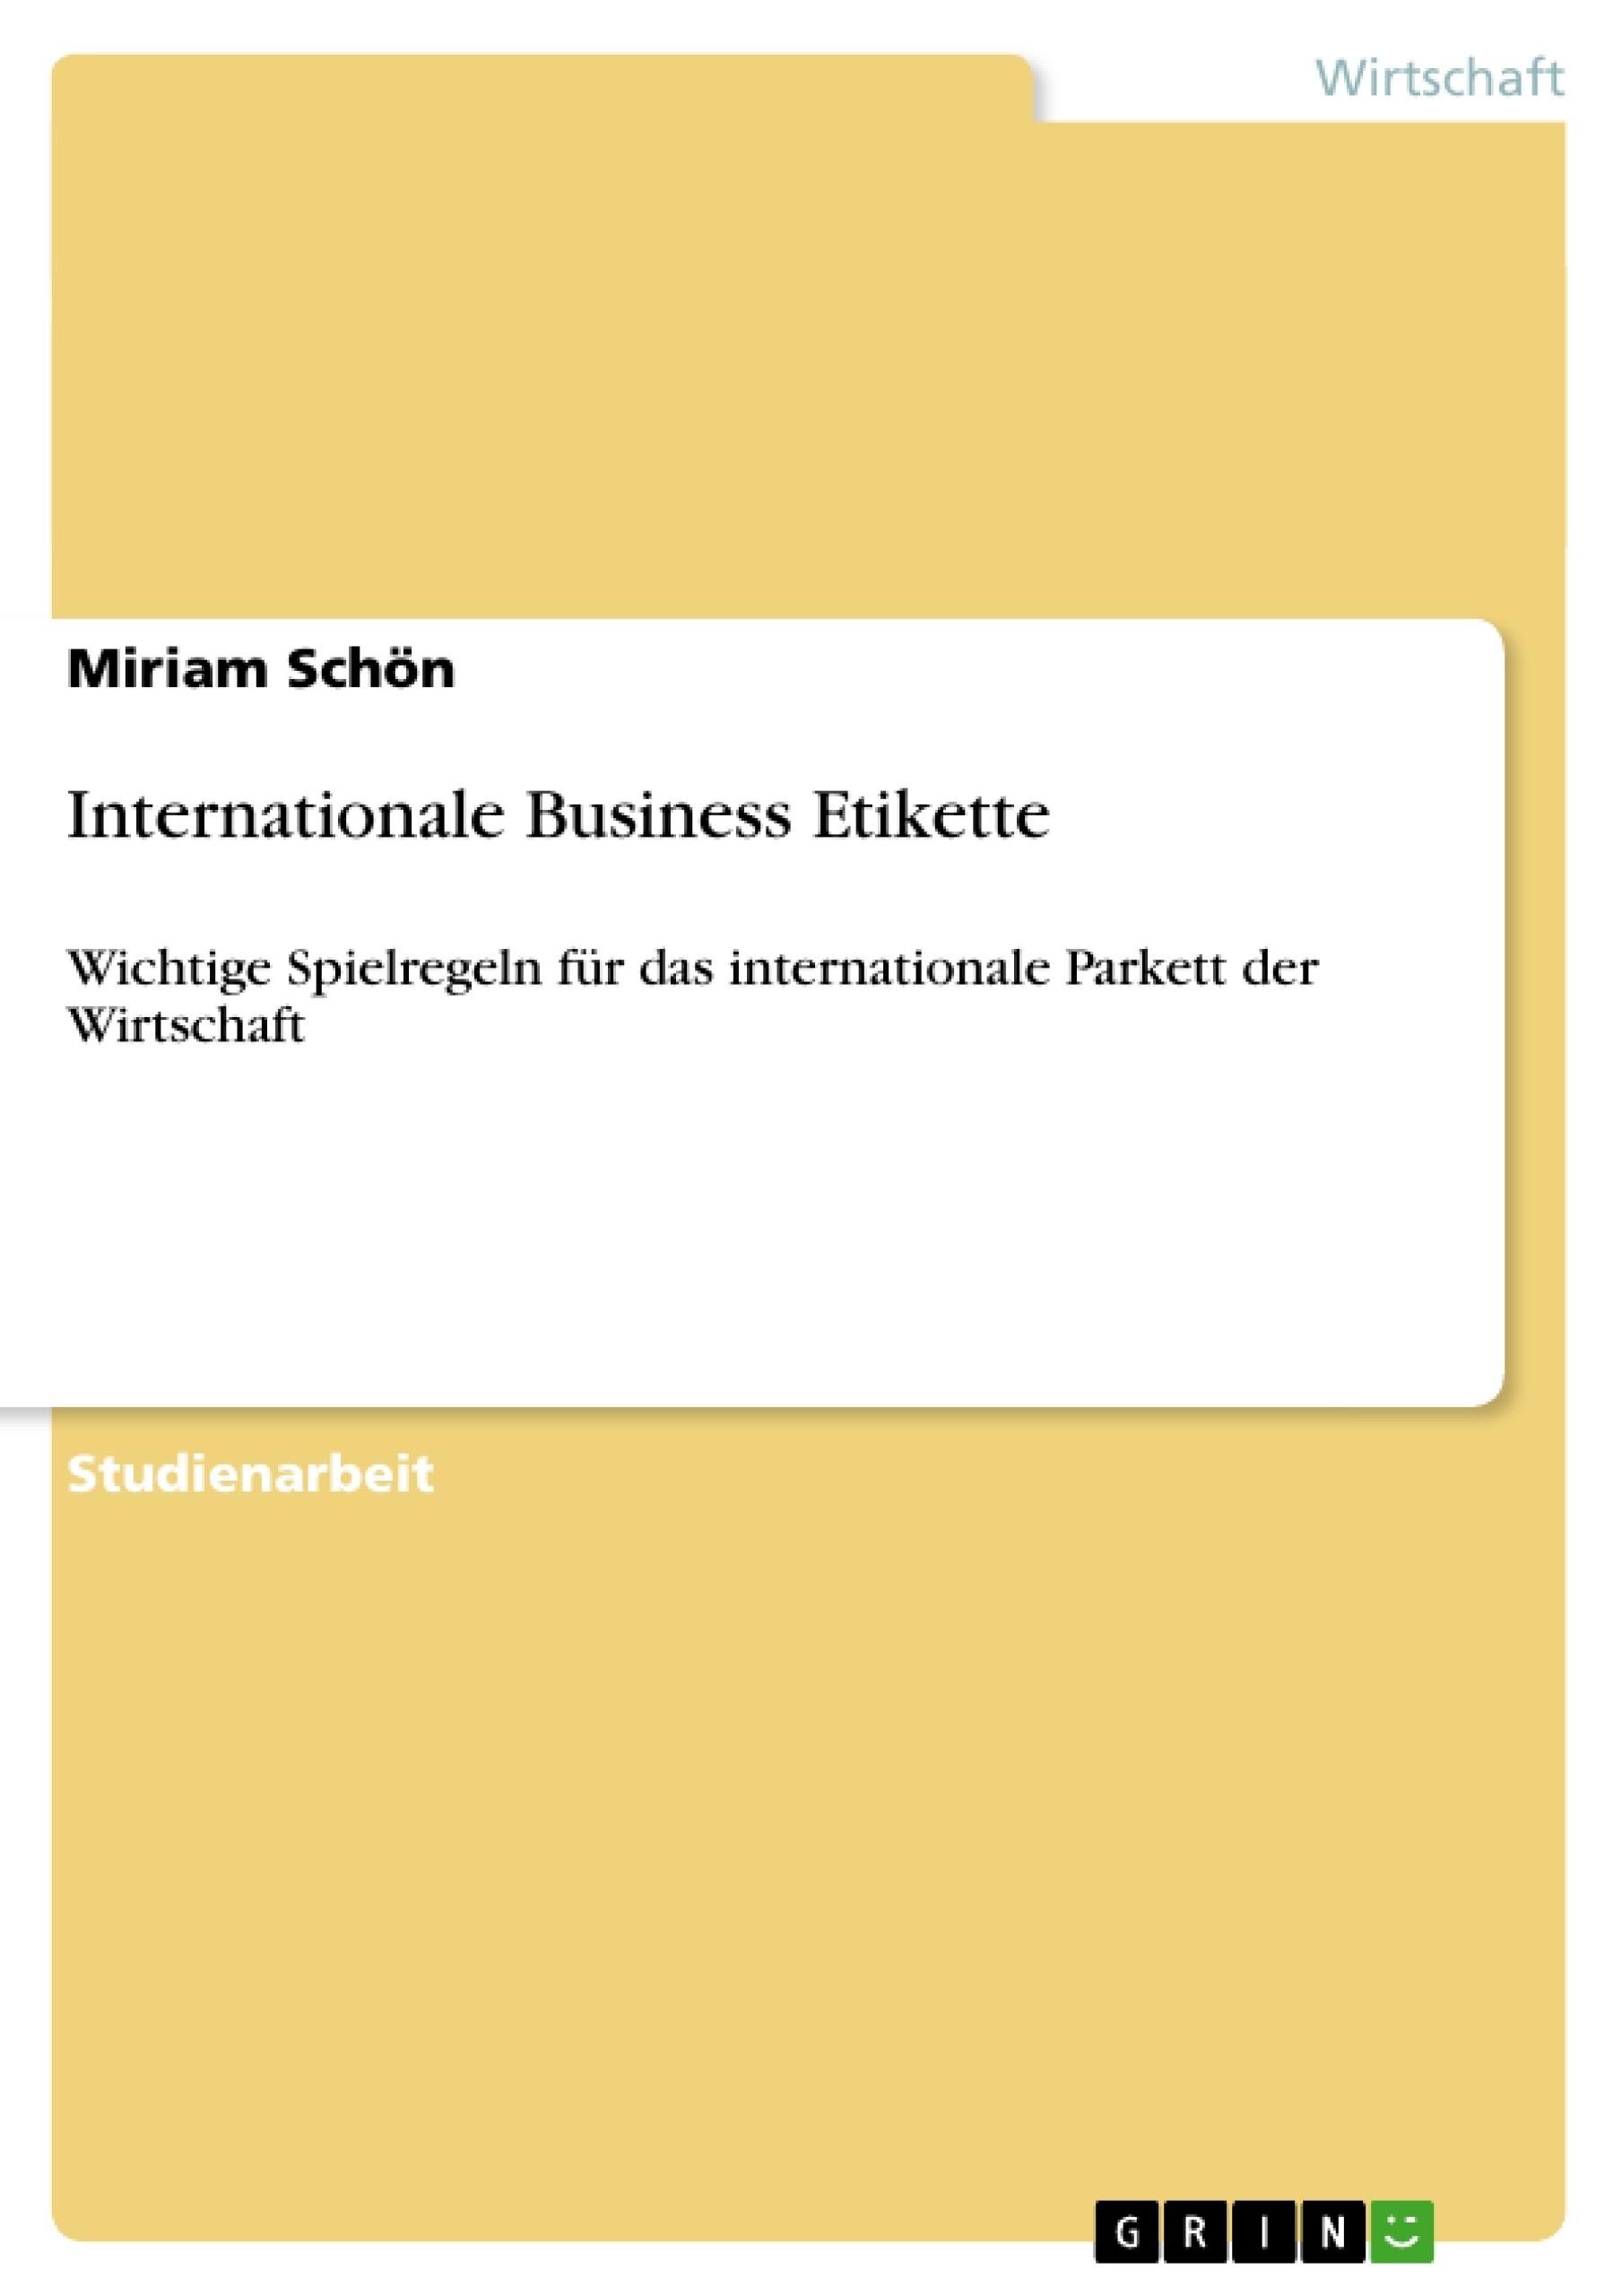 Titel: Internationale Business Etikette